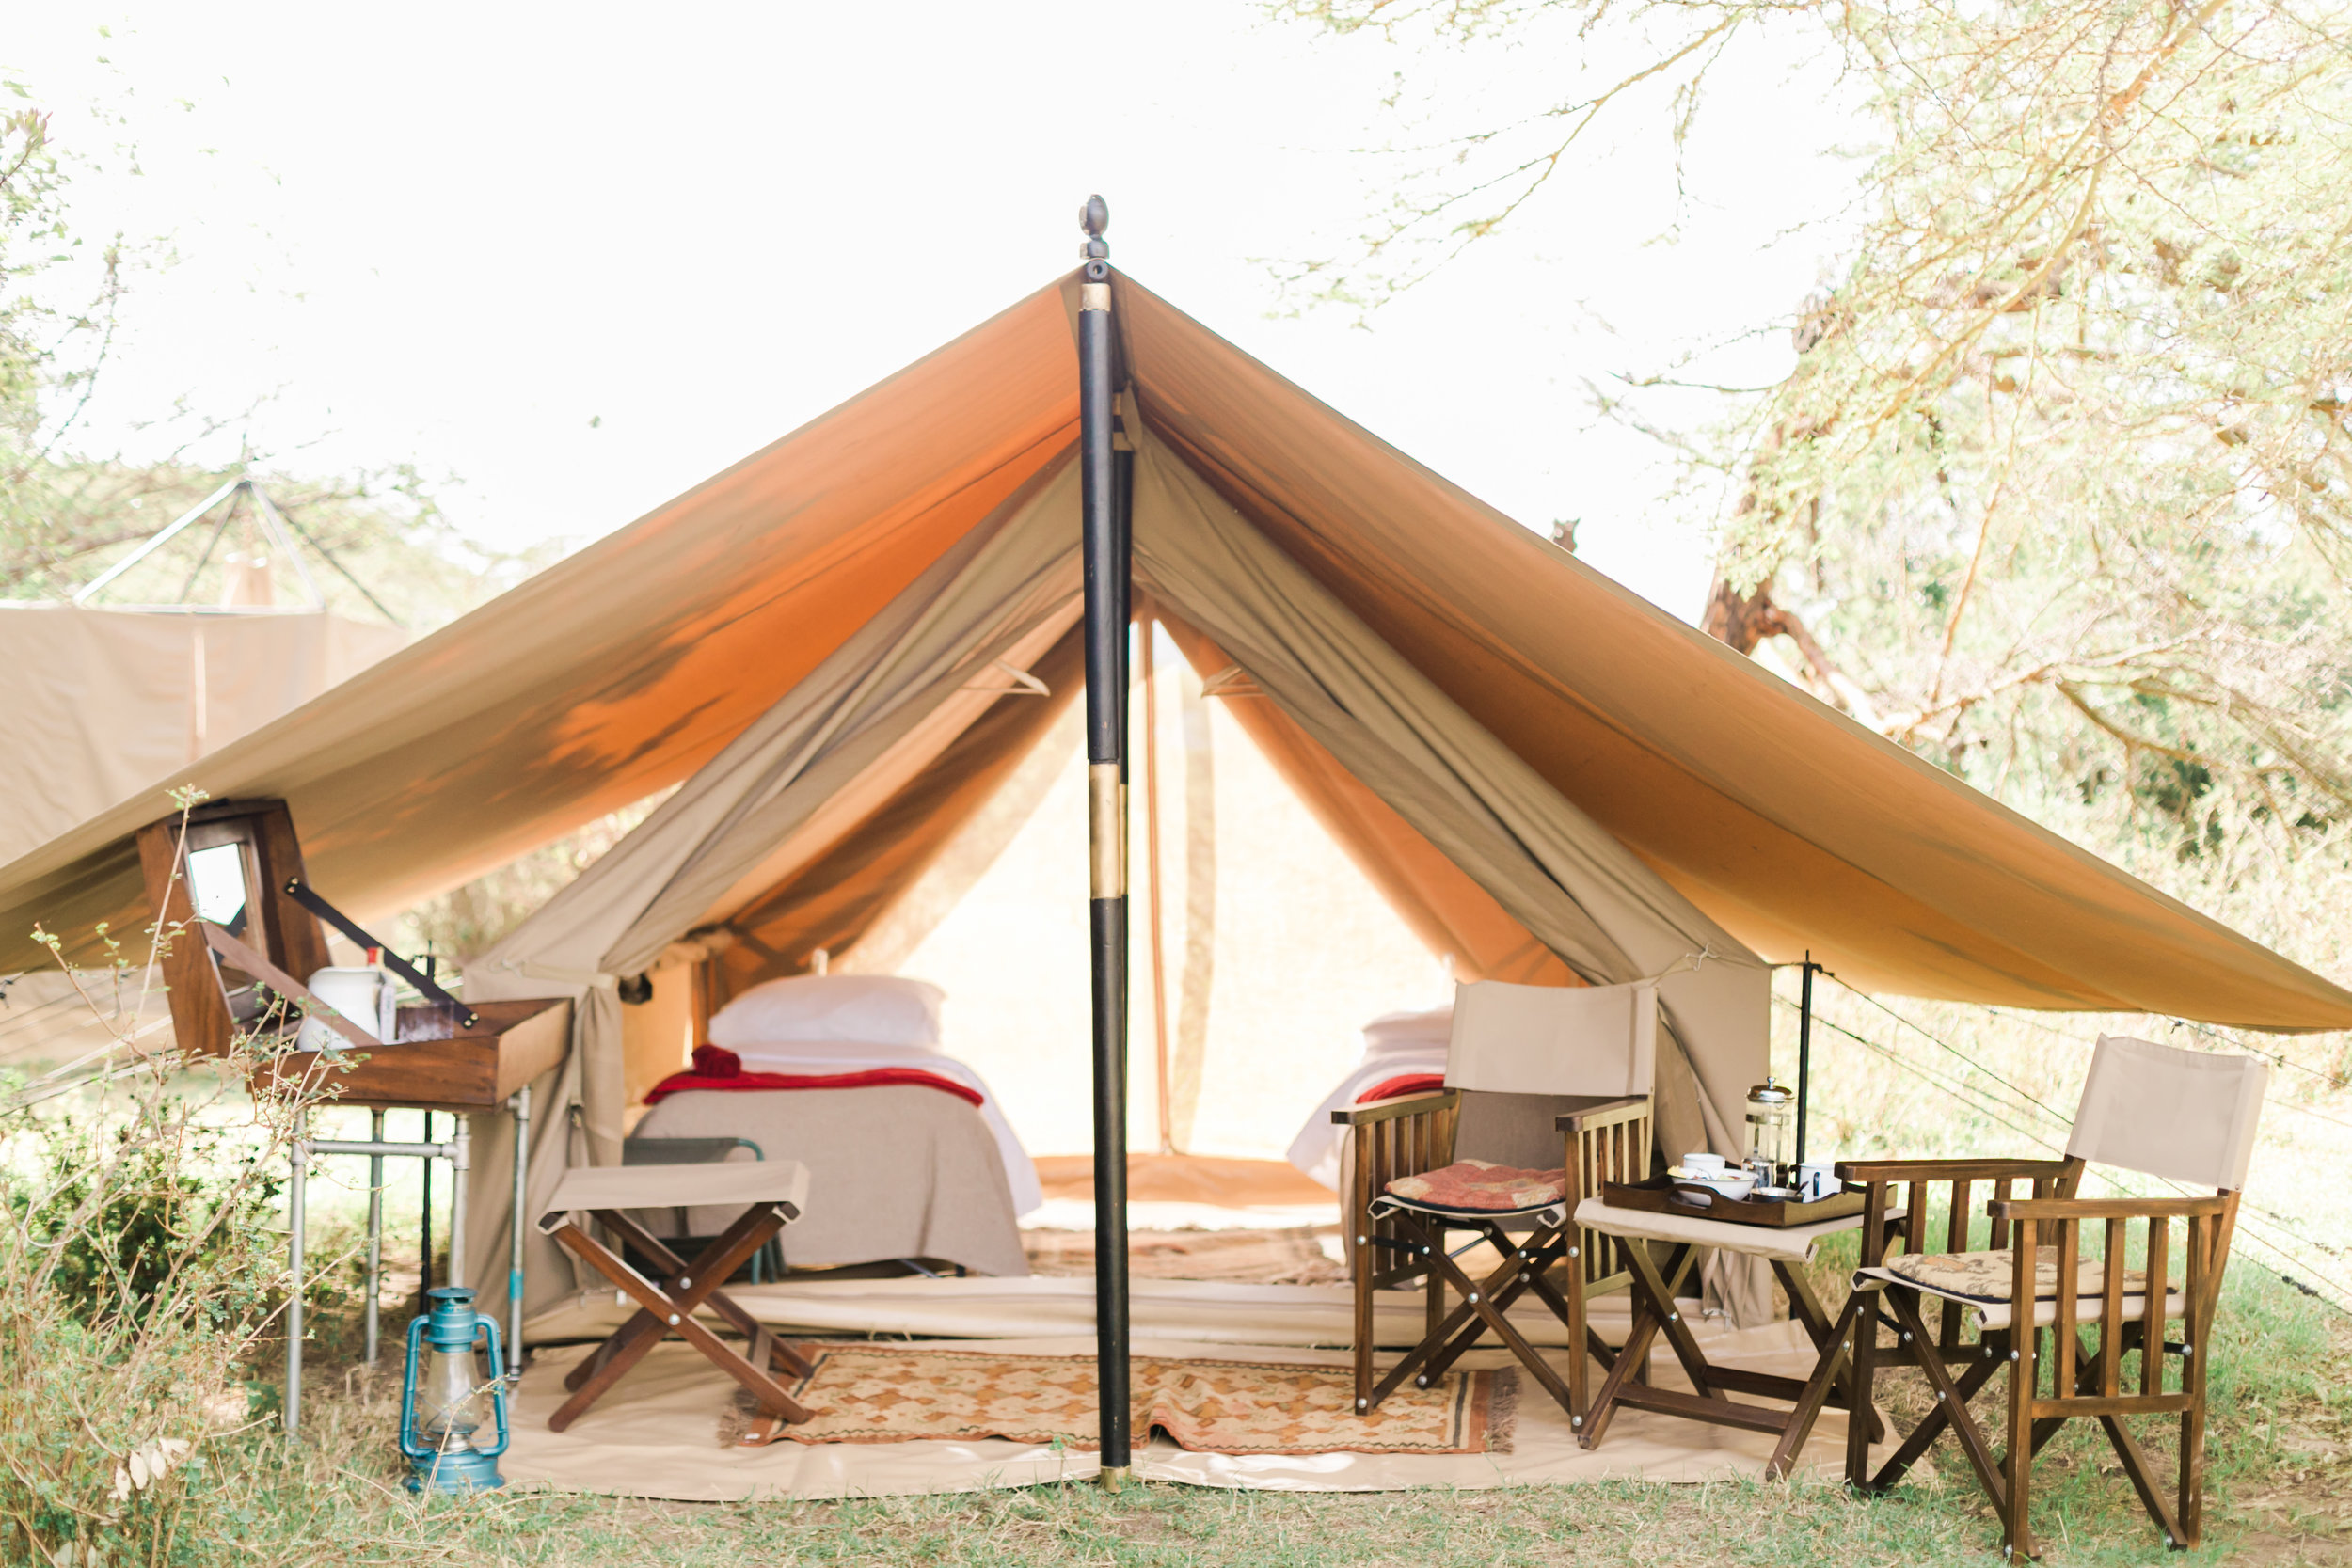 Cottar's Fly Camp Tents - Kenya Safari Ph. Valorie Darling